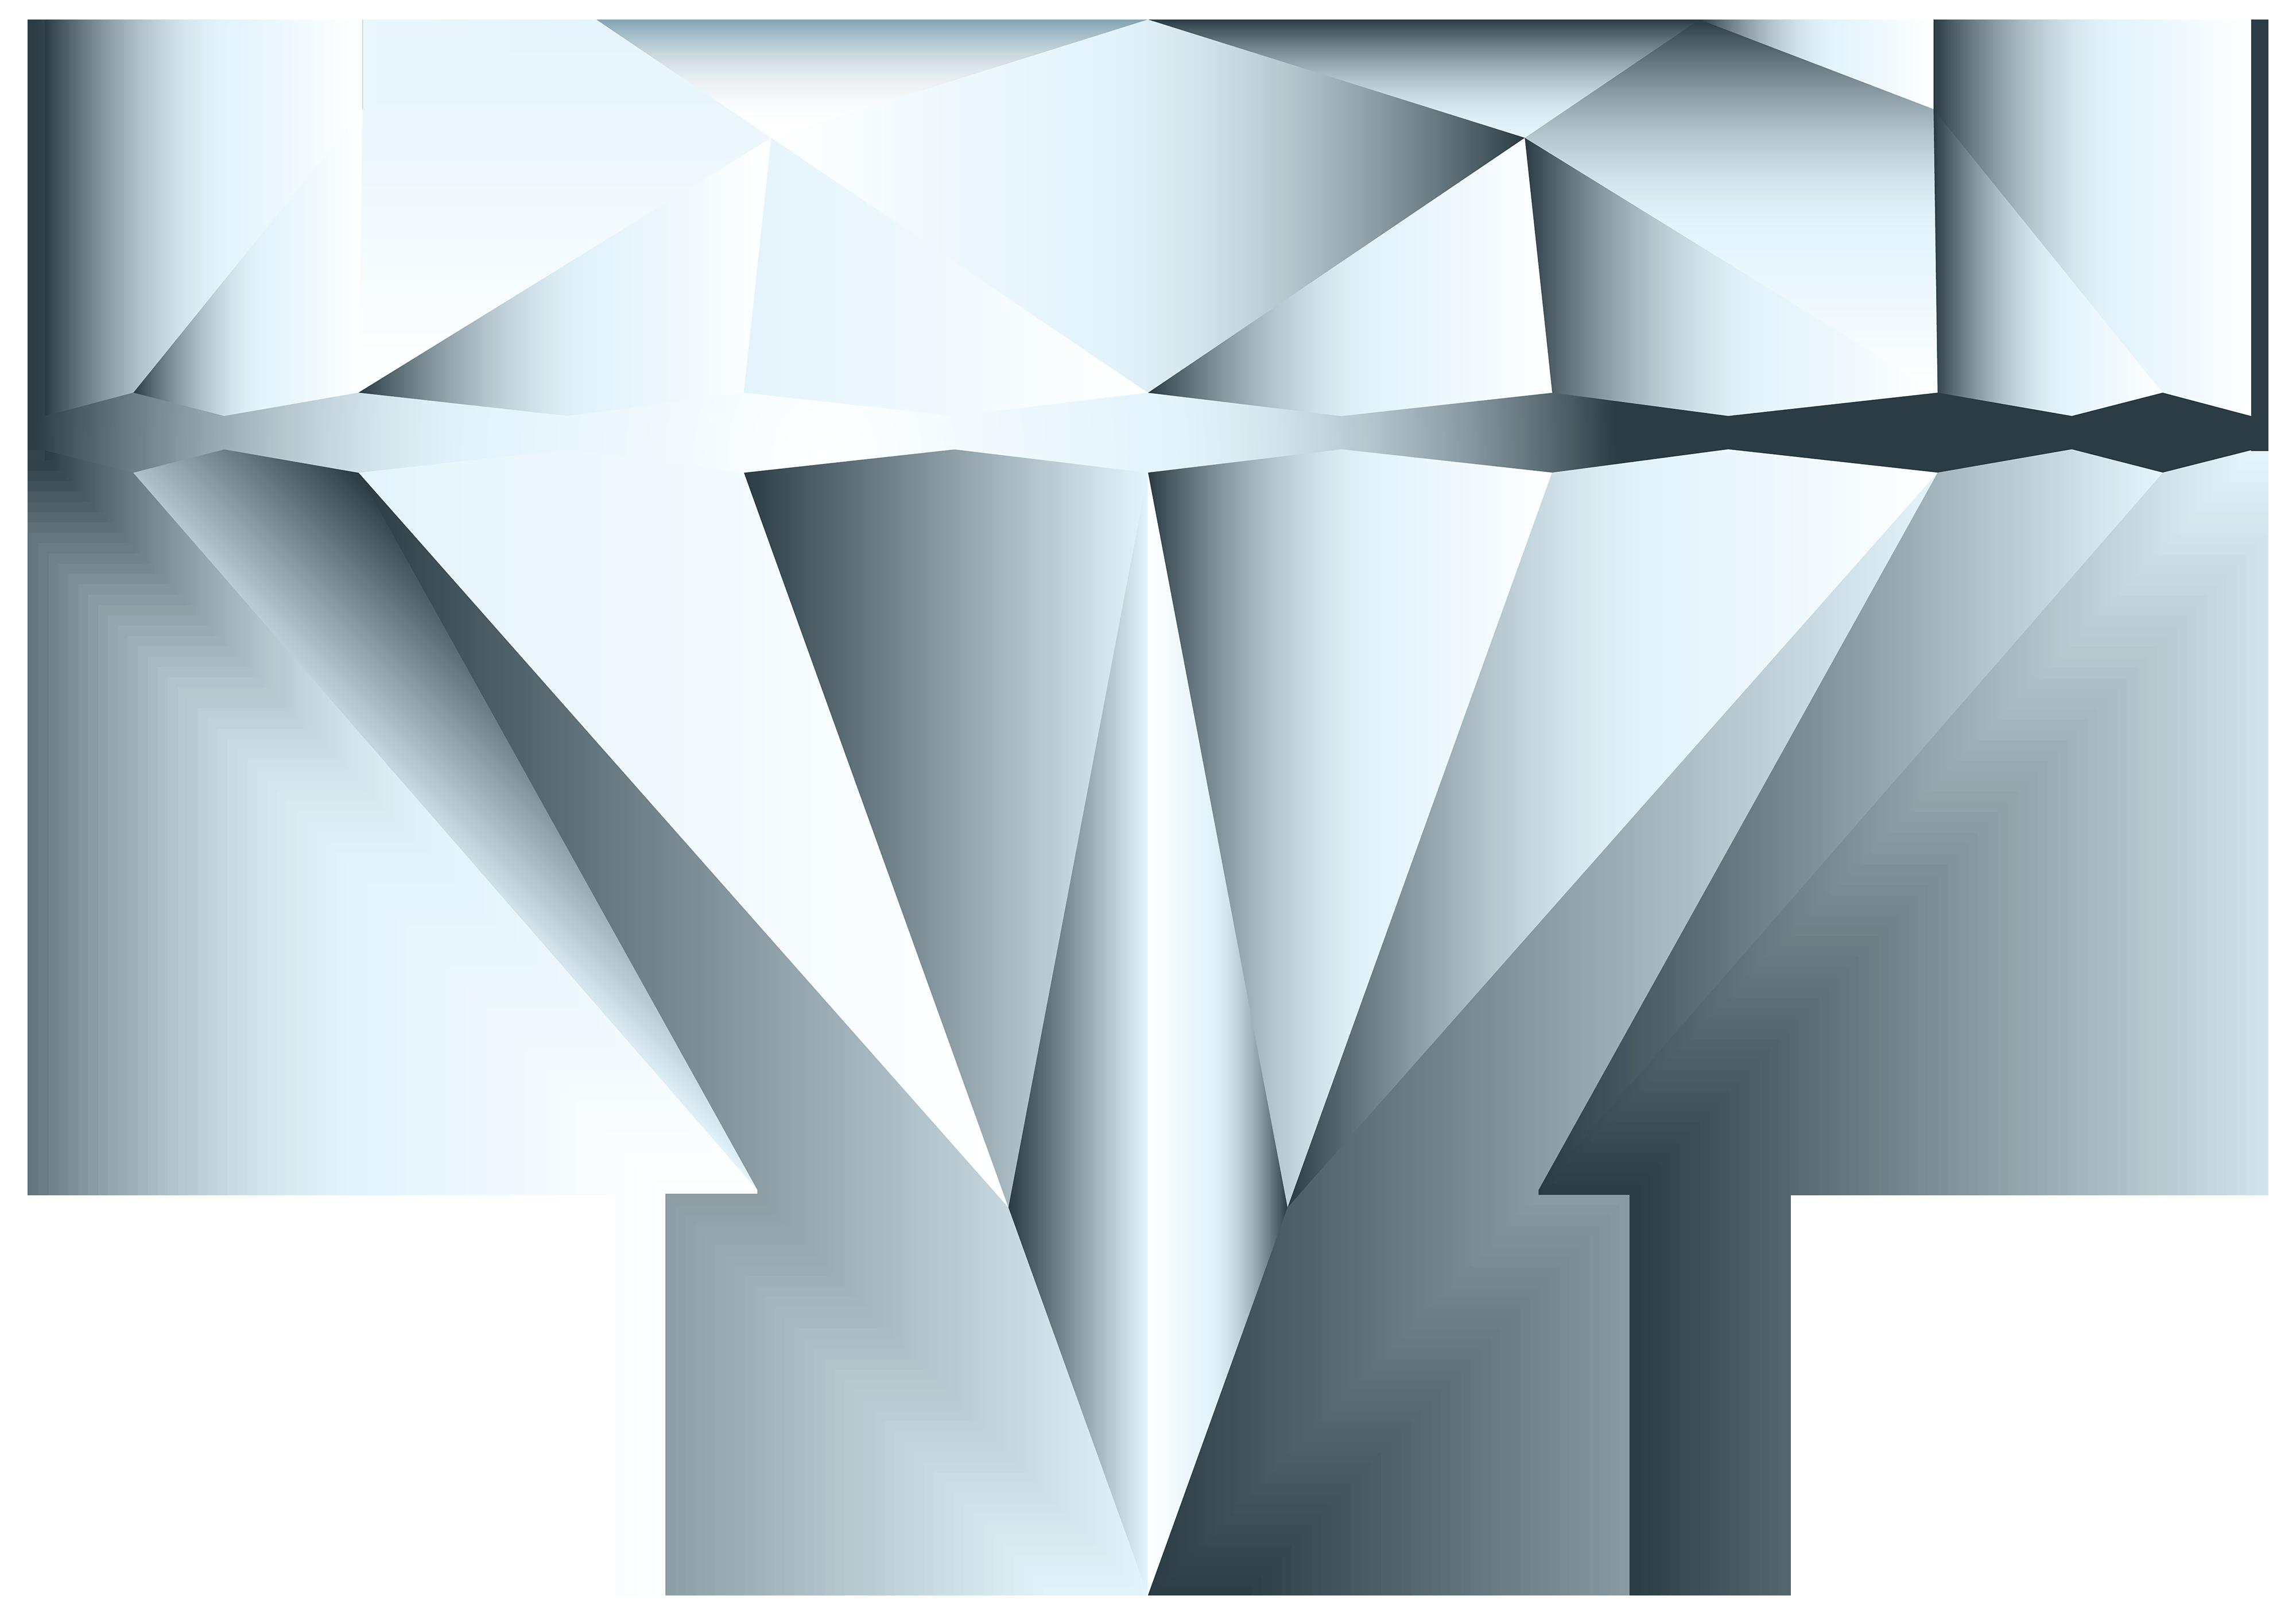 clip download Diamond clipart. Png image best web.